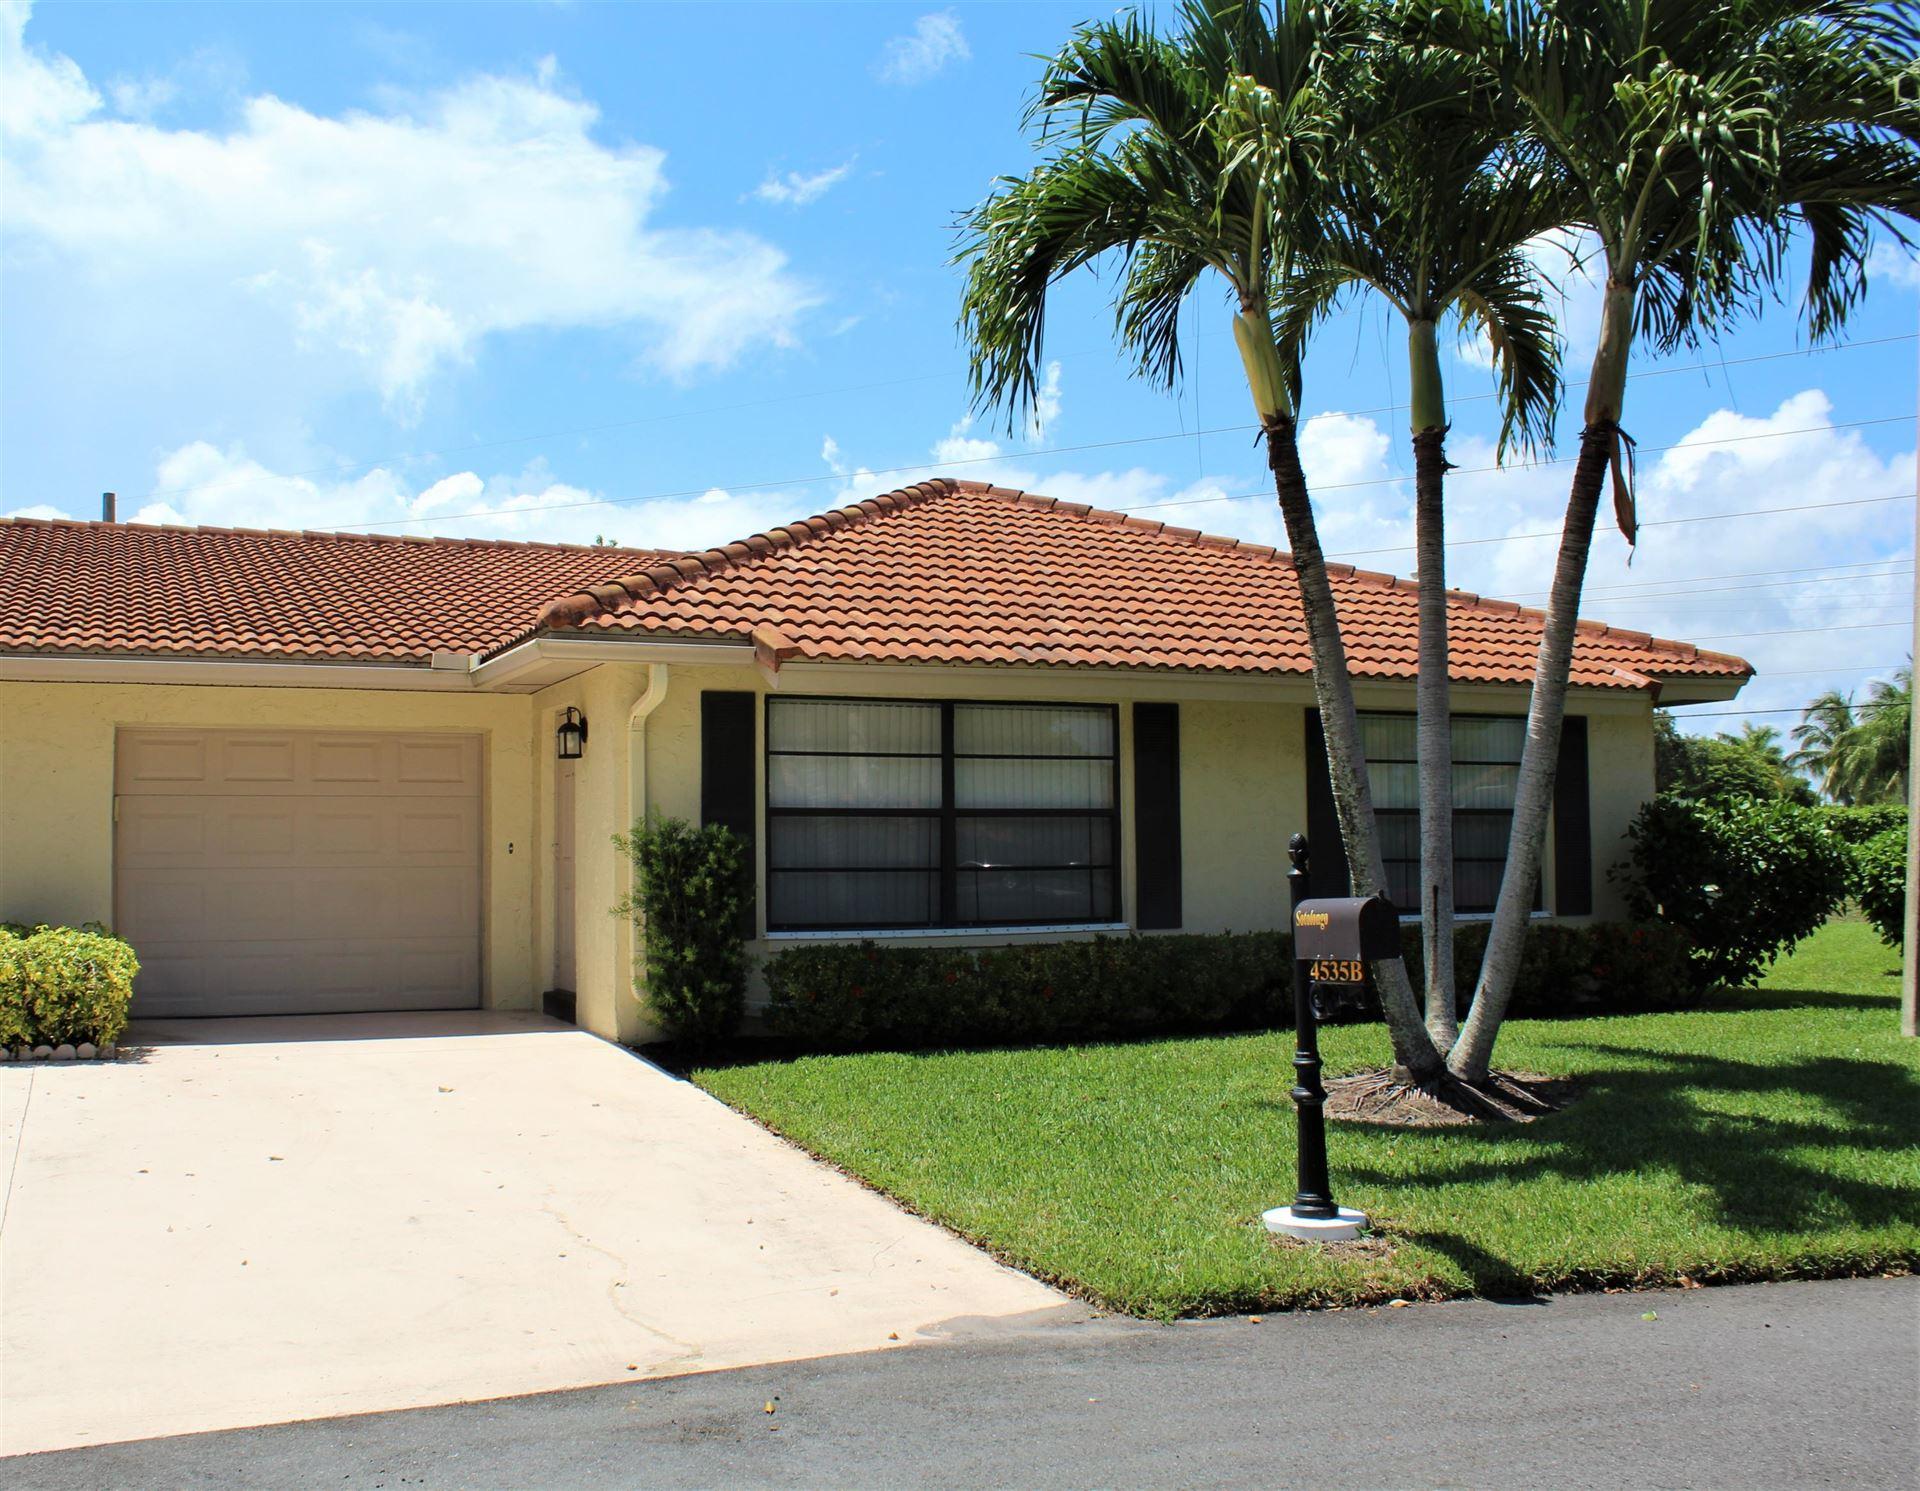 4535 Pandanus Tree Road #B, Boynton Beach, FL 33436 - #: RX-10632575